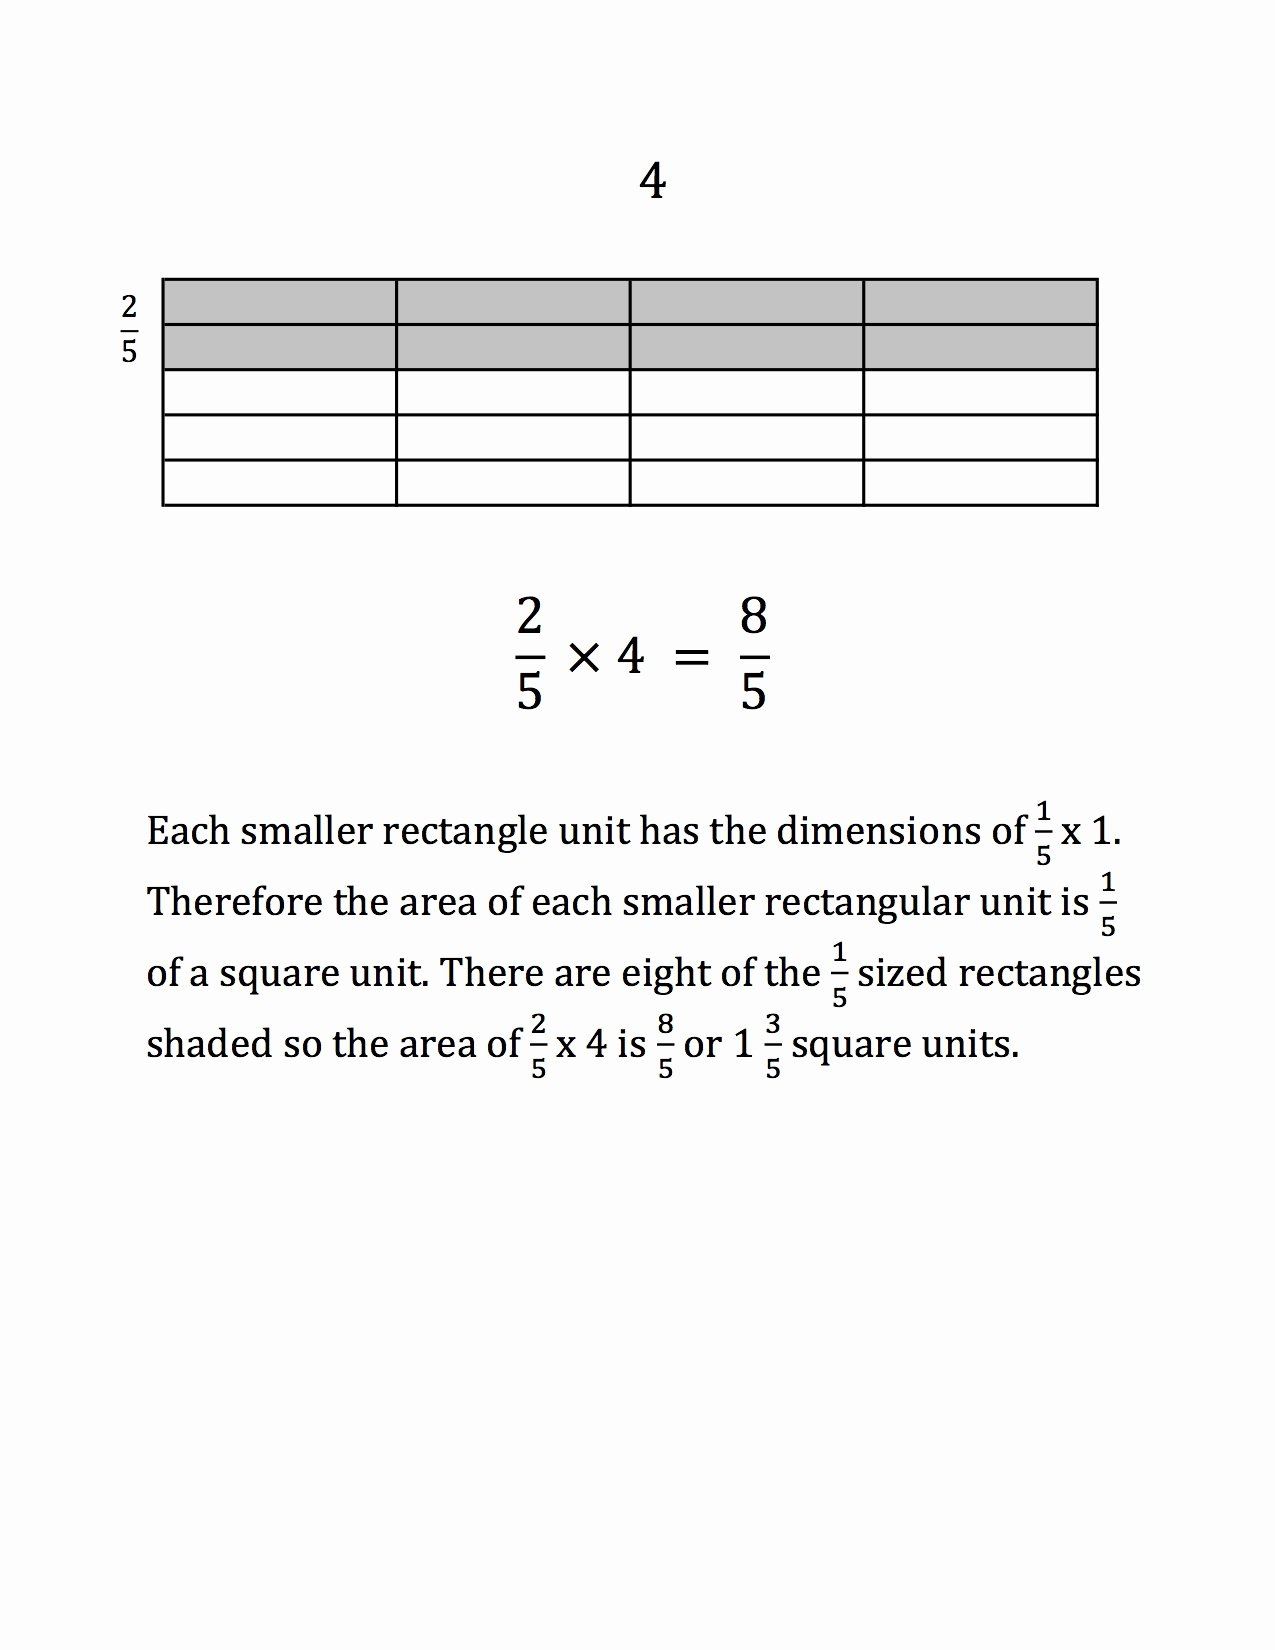 Dividing Fractions Using Models Worksheet Inspirational Copy Multiply and Divide Fractions Visual Models